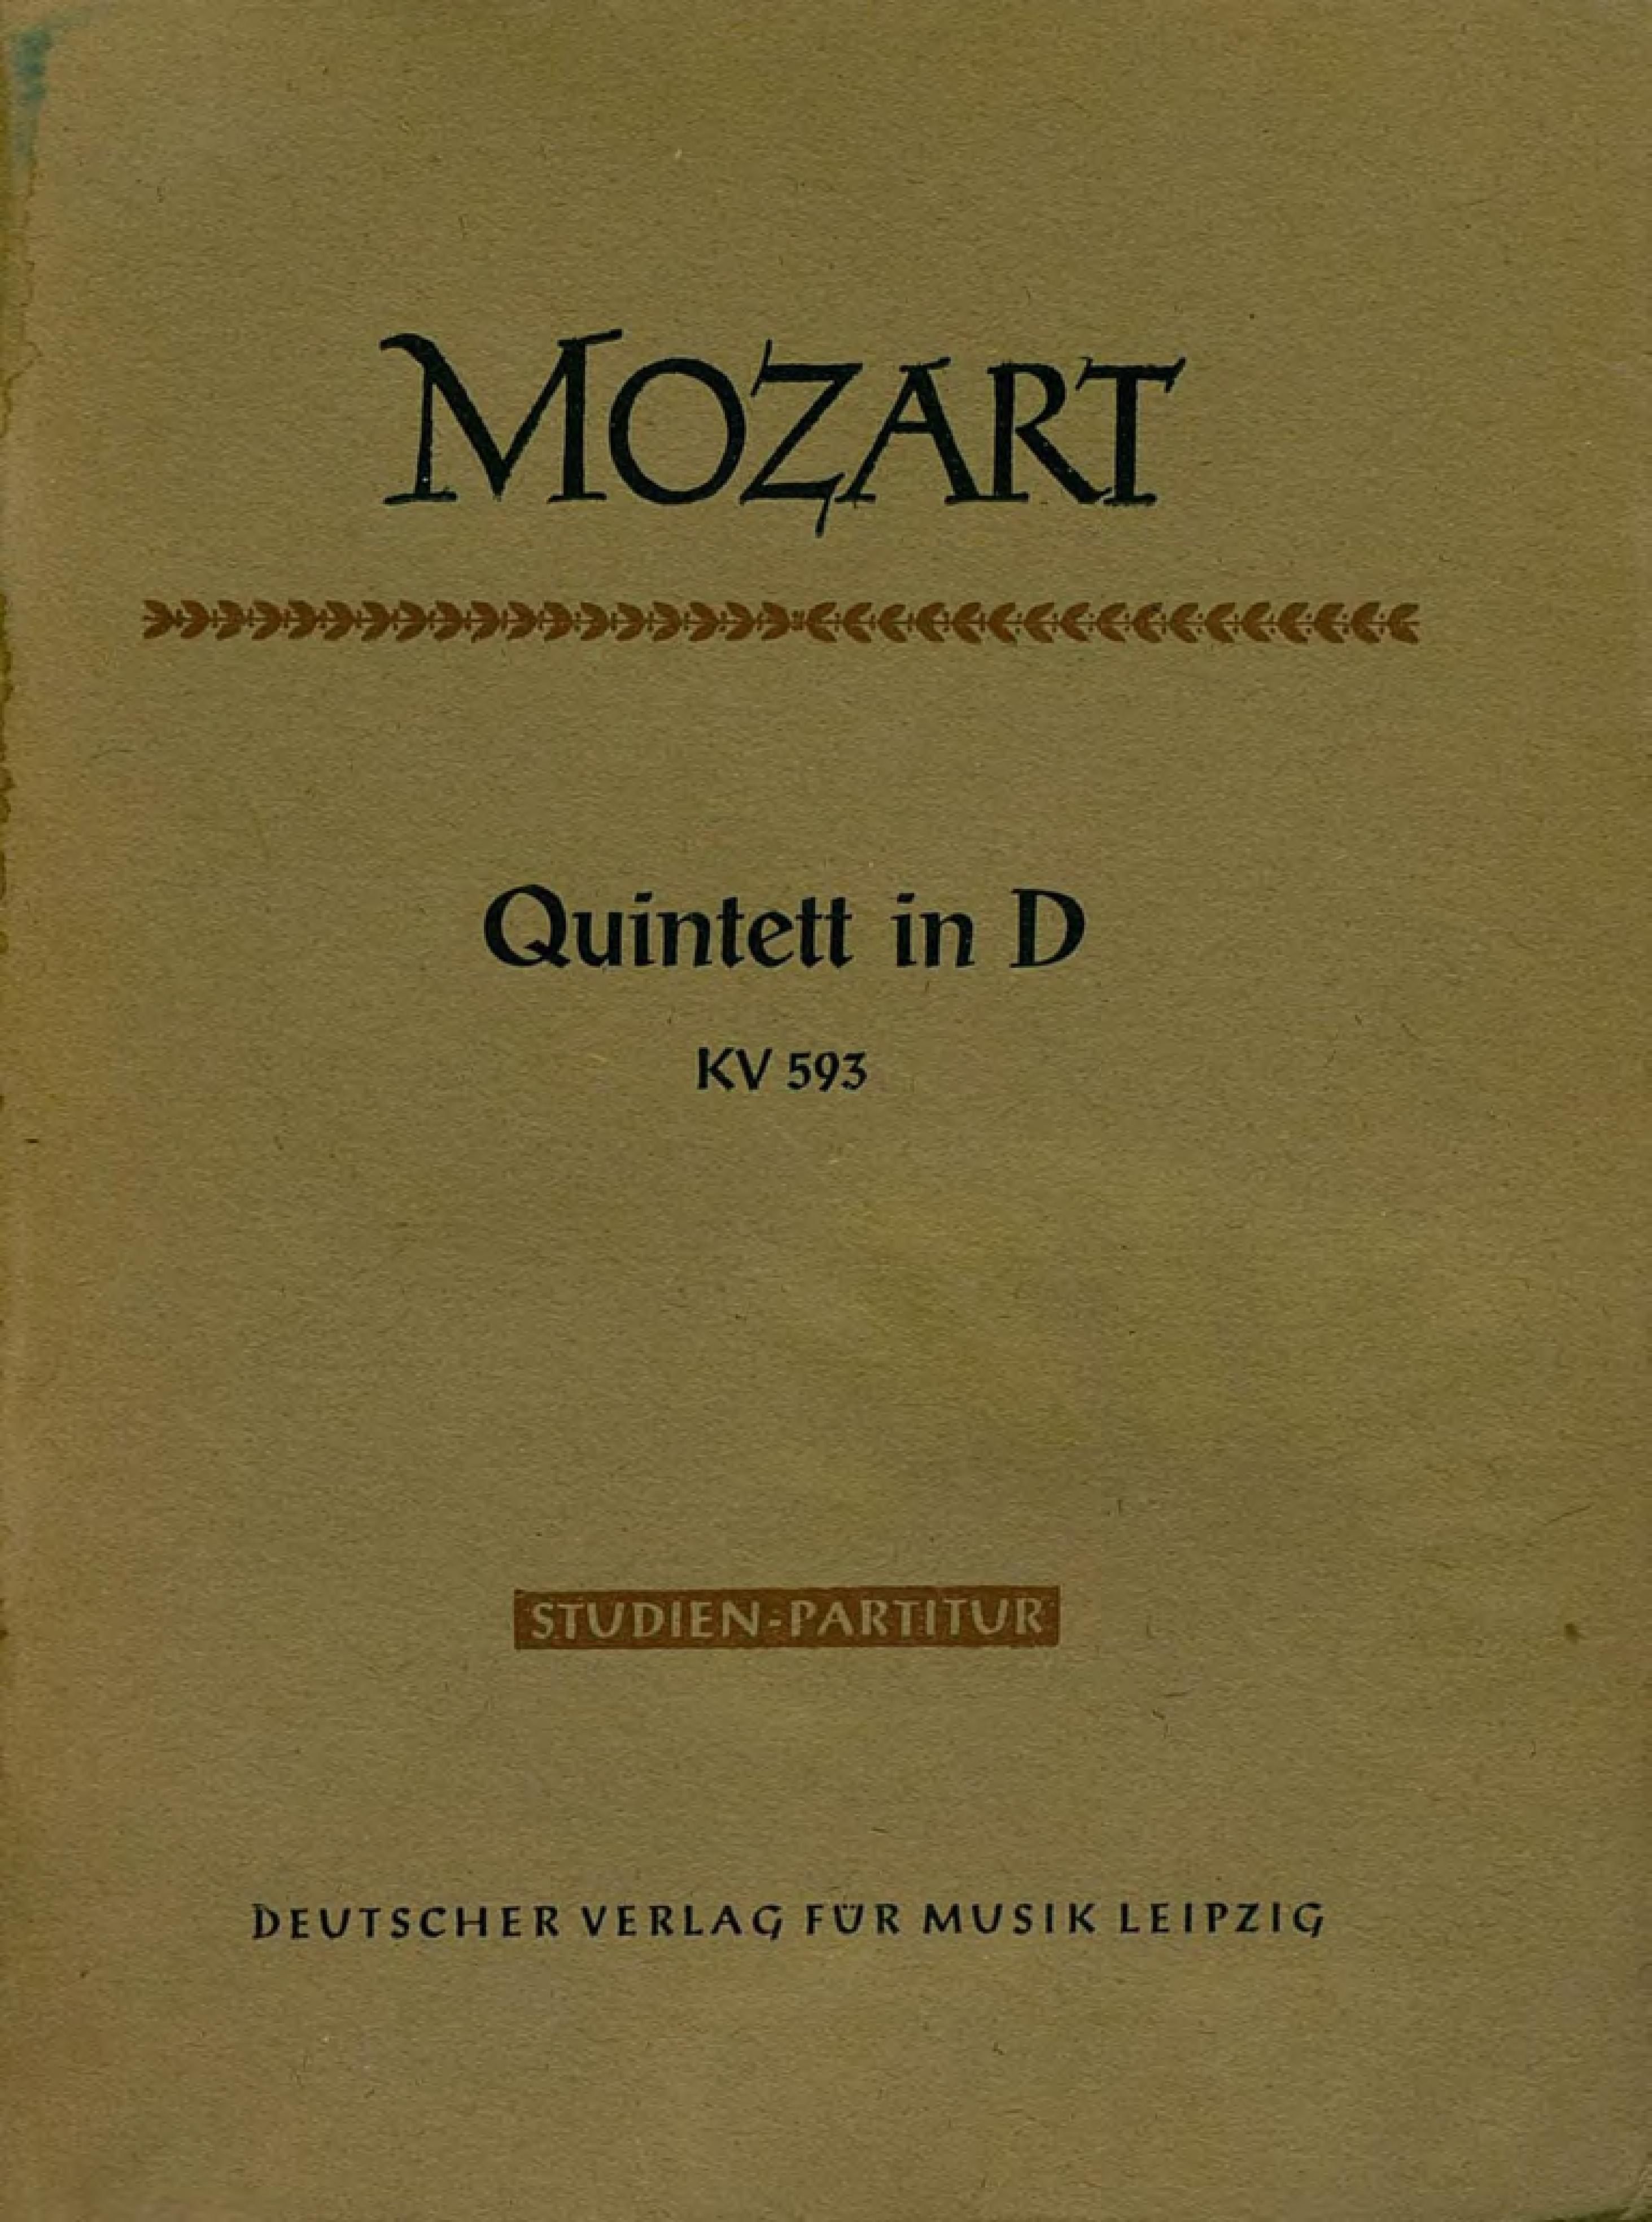 Вольфганг Амадей Моцарт Quintett in D fur 2 Violinen, 2 Violen und Violoncello джузеппе верди quartett fur 2 violinen viola und violoncell v g verdi e moll